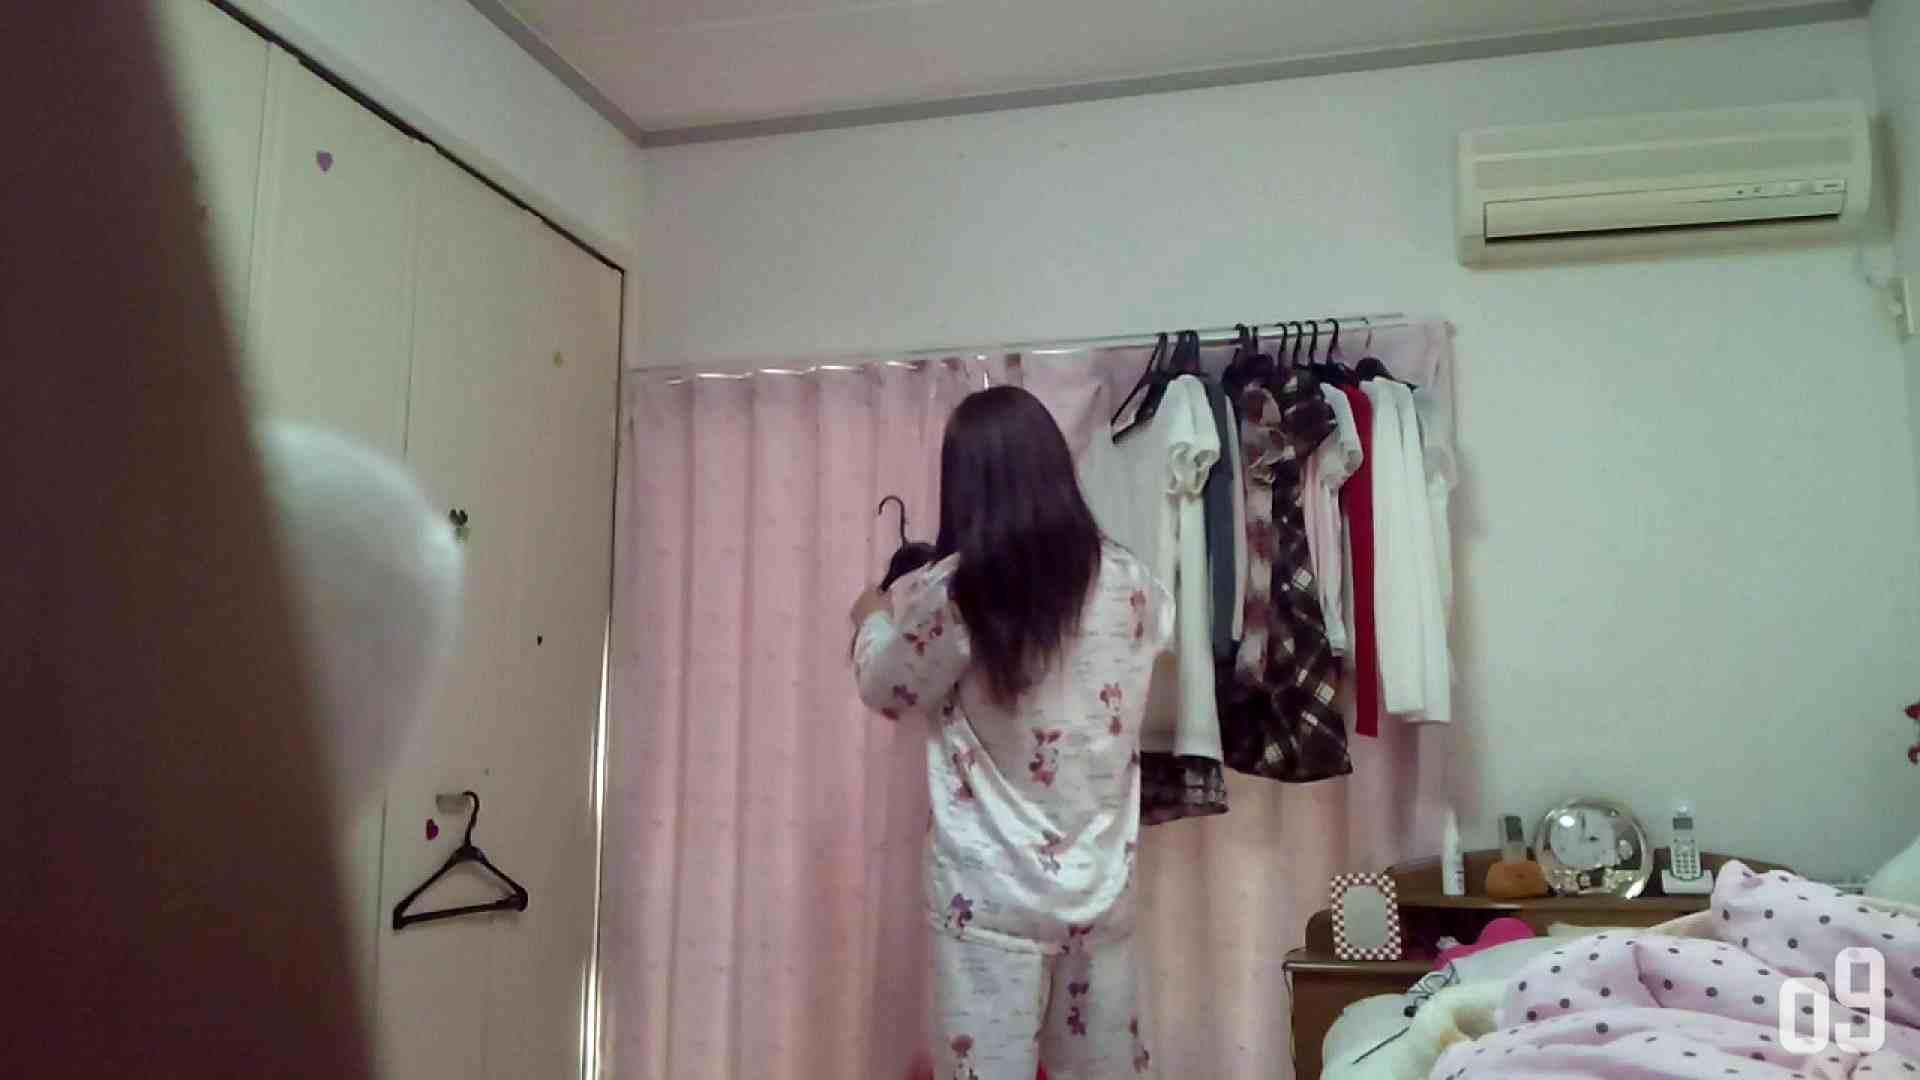 vol.2 瑞希ちゃんの自宅公開!寝起きの着替え・・・ラリルそー OLヌード天国  94PIX 20